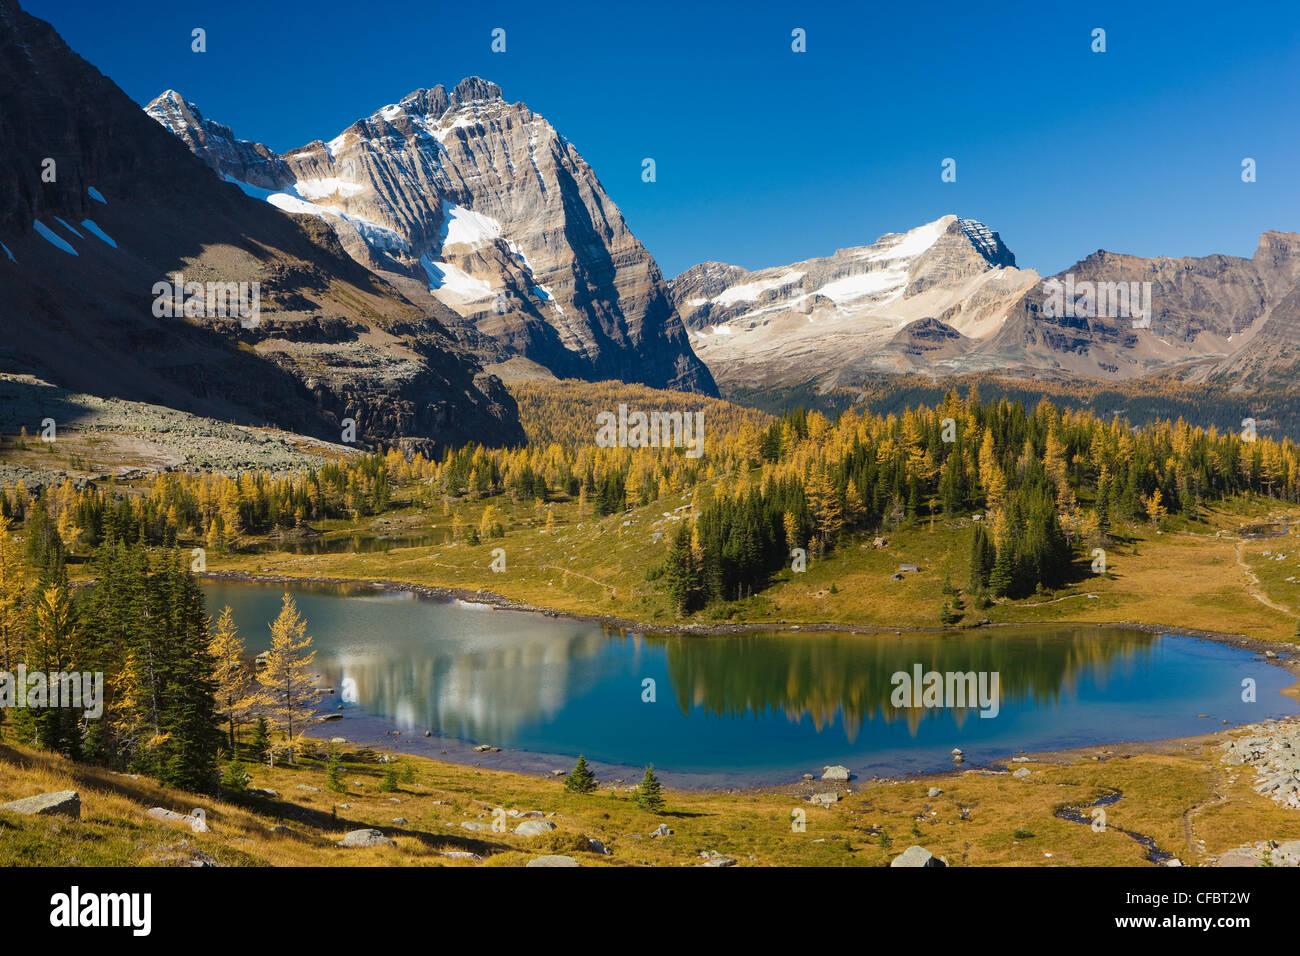 Overview of Opabin Plateau, Lake O'Hara, Yoho National Park, British Columbia, Canada - Stock Image